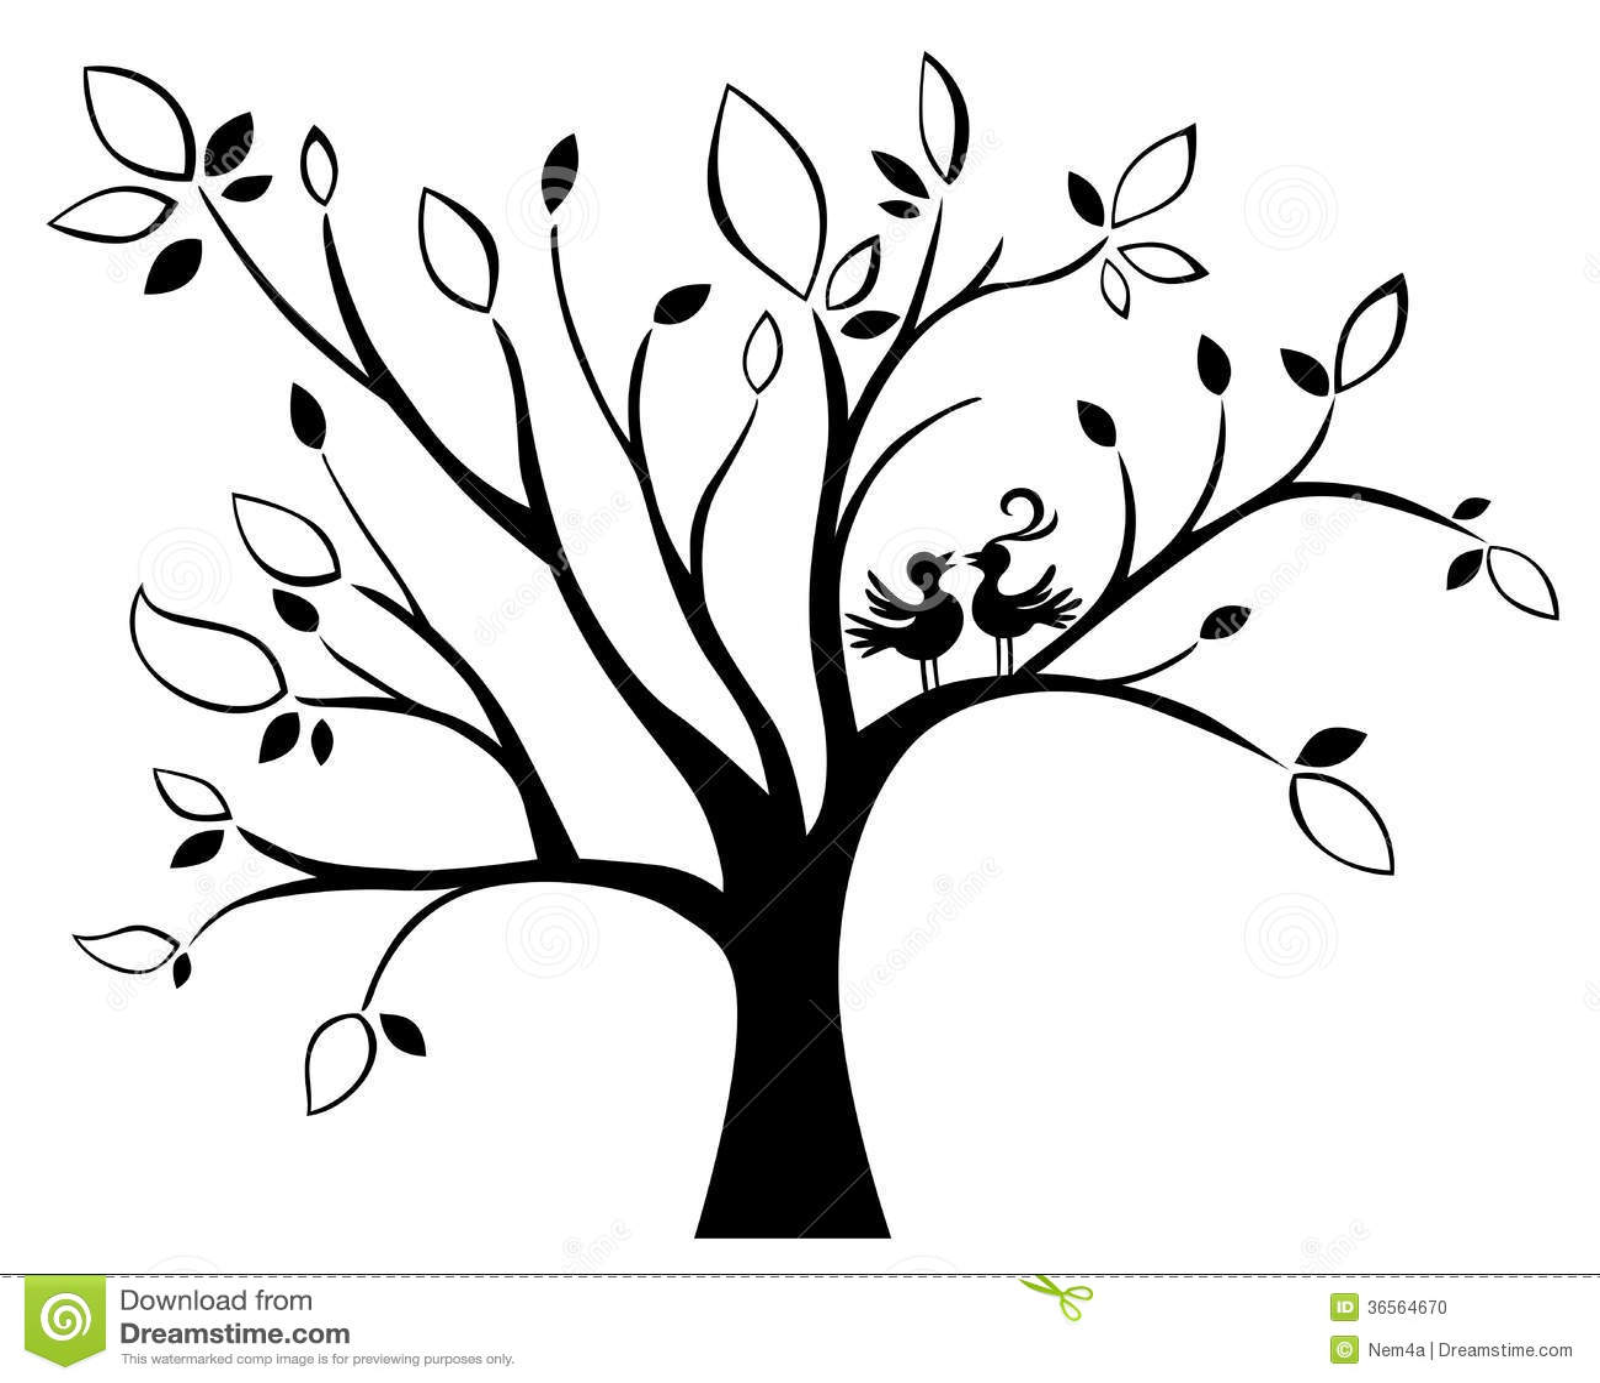 arbre de mariage photo stock image 36564670. Black Bedroom Furniture Sets. Home Design Ideas